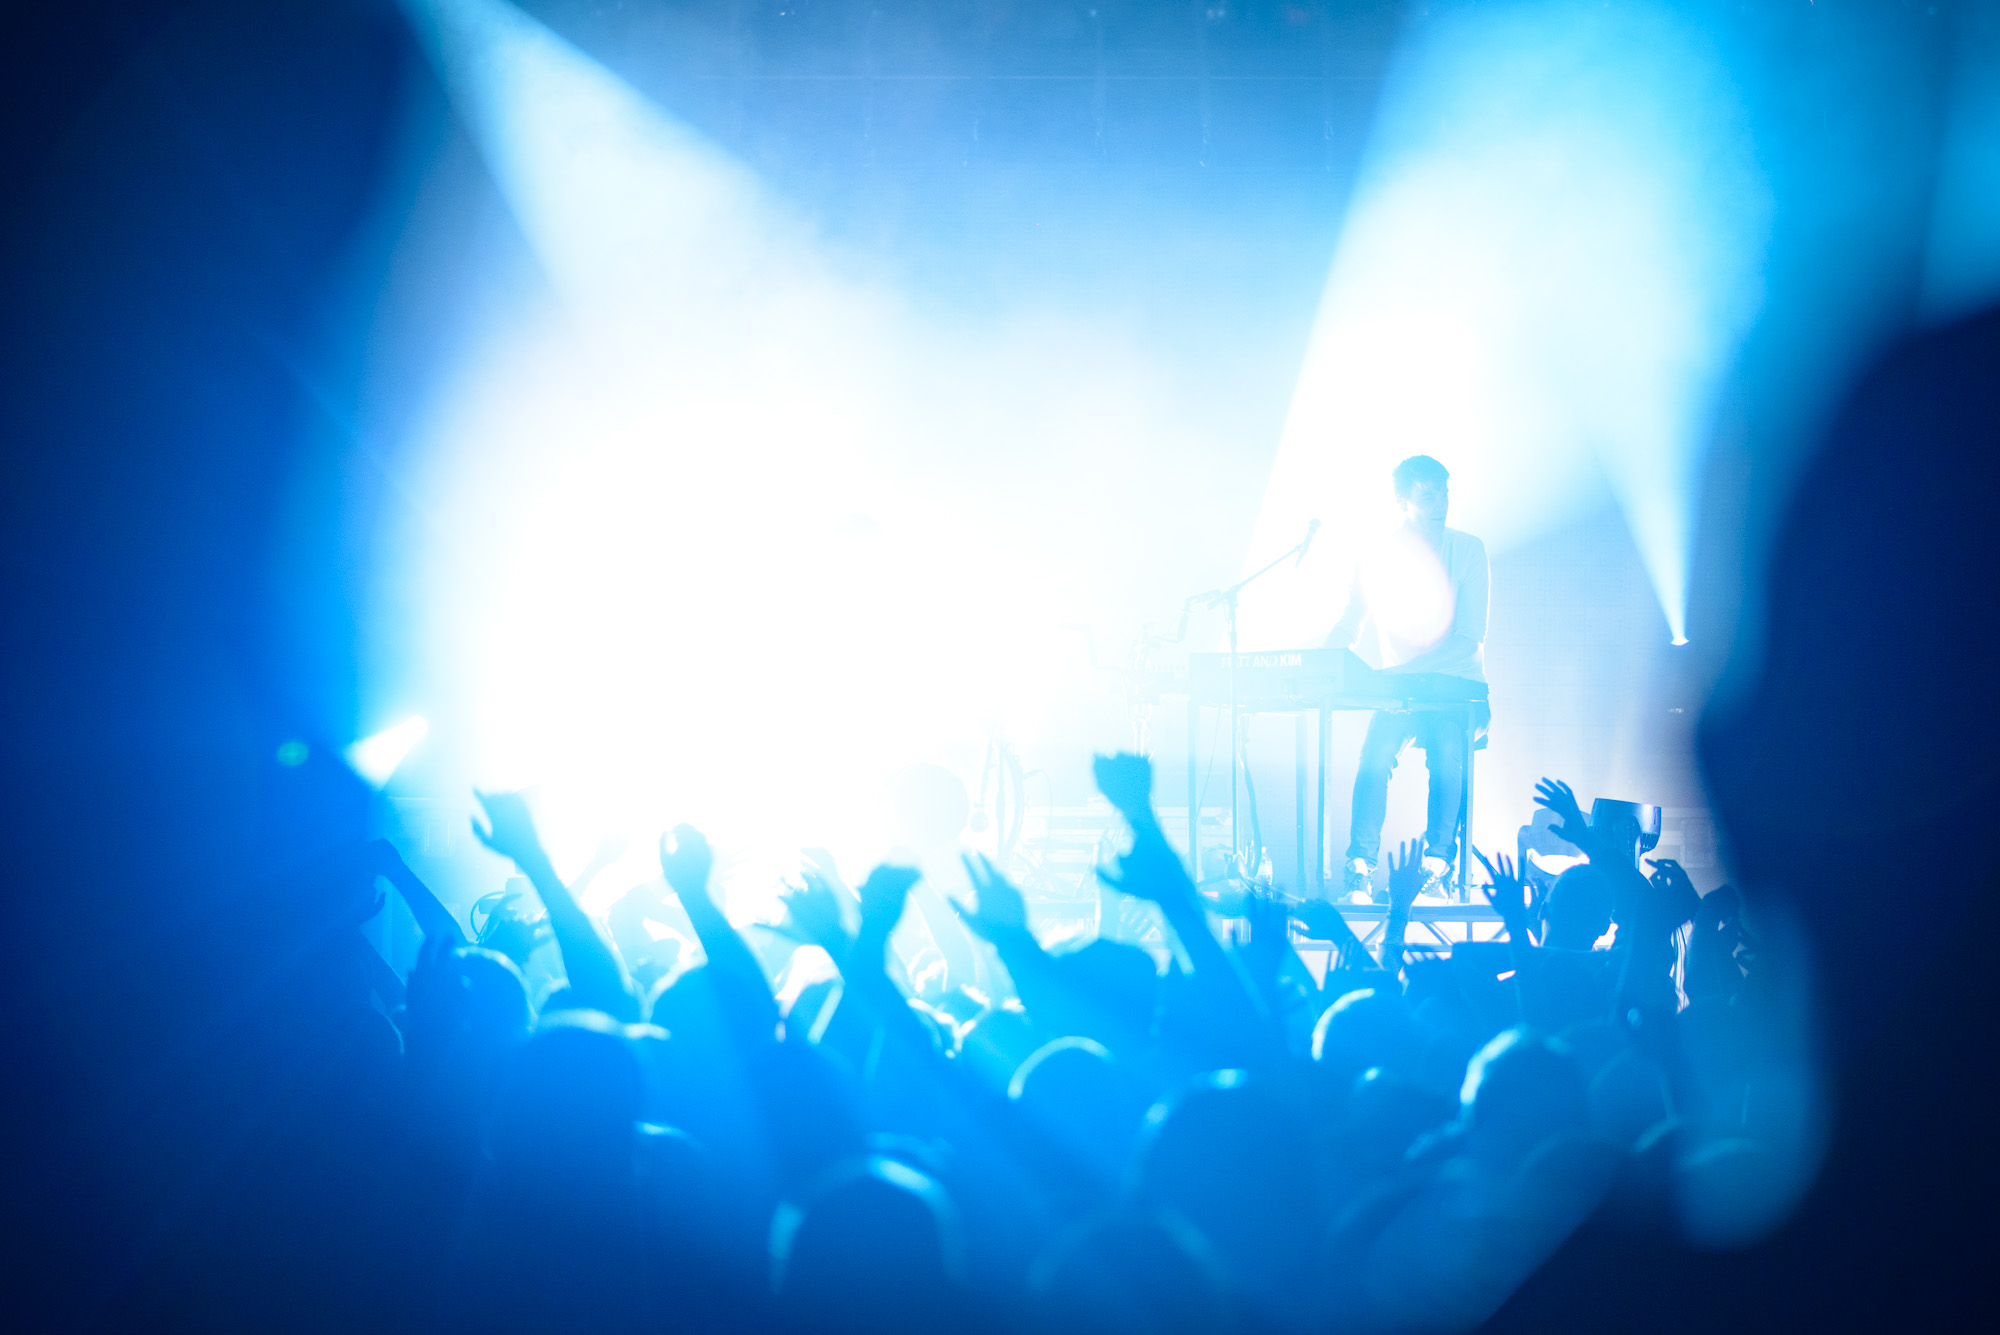 Gallery: Matt and Kim Concert